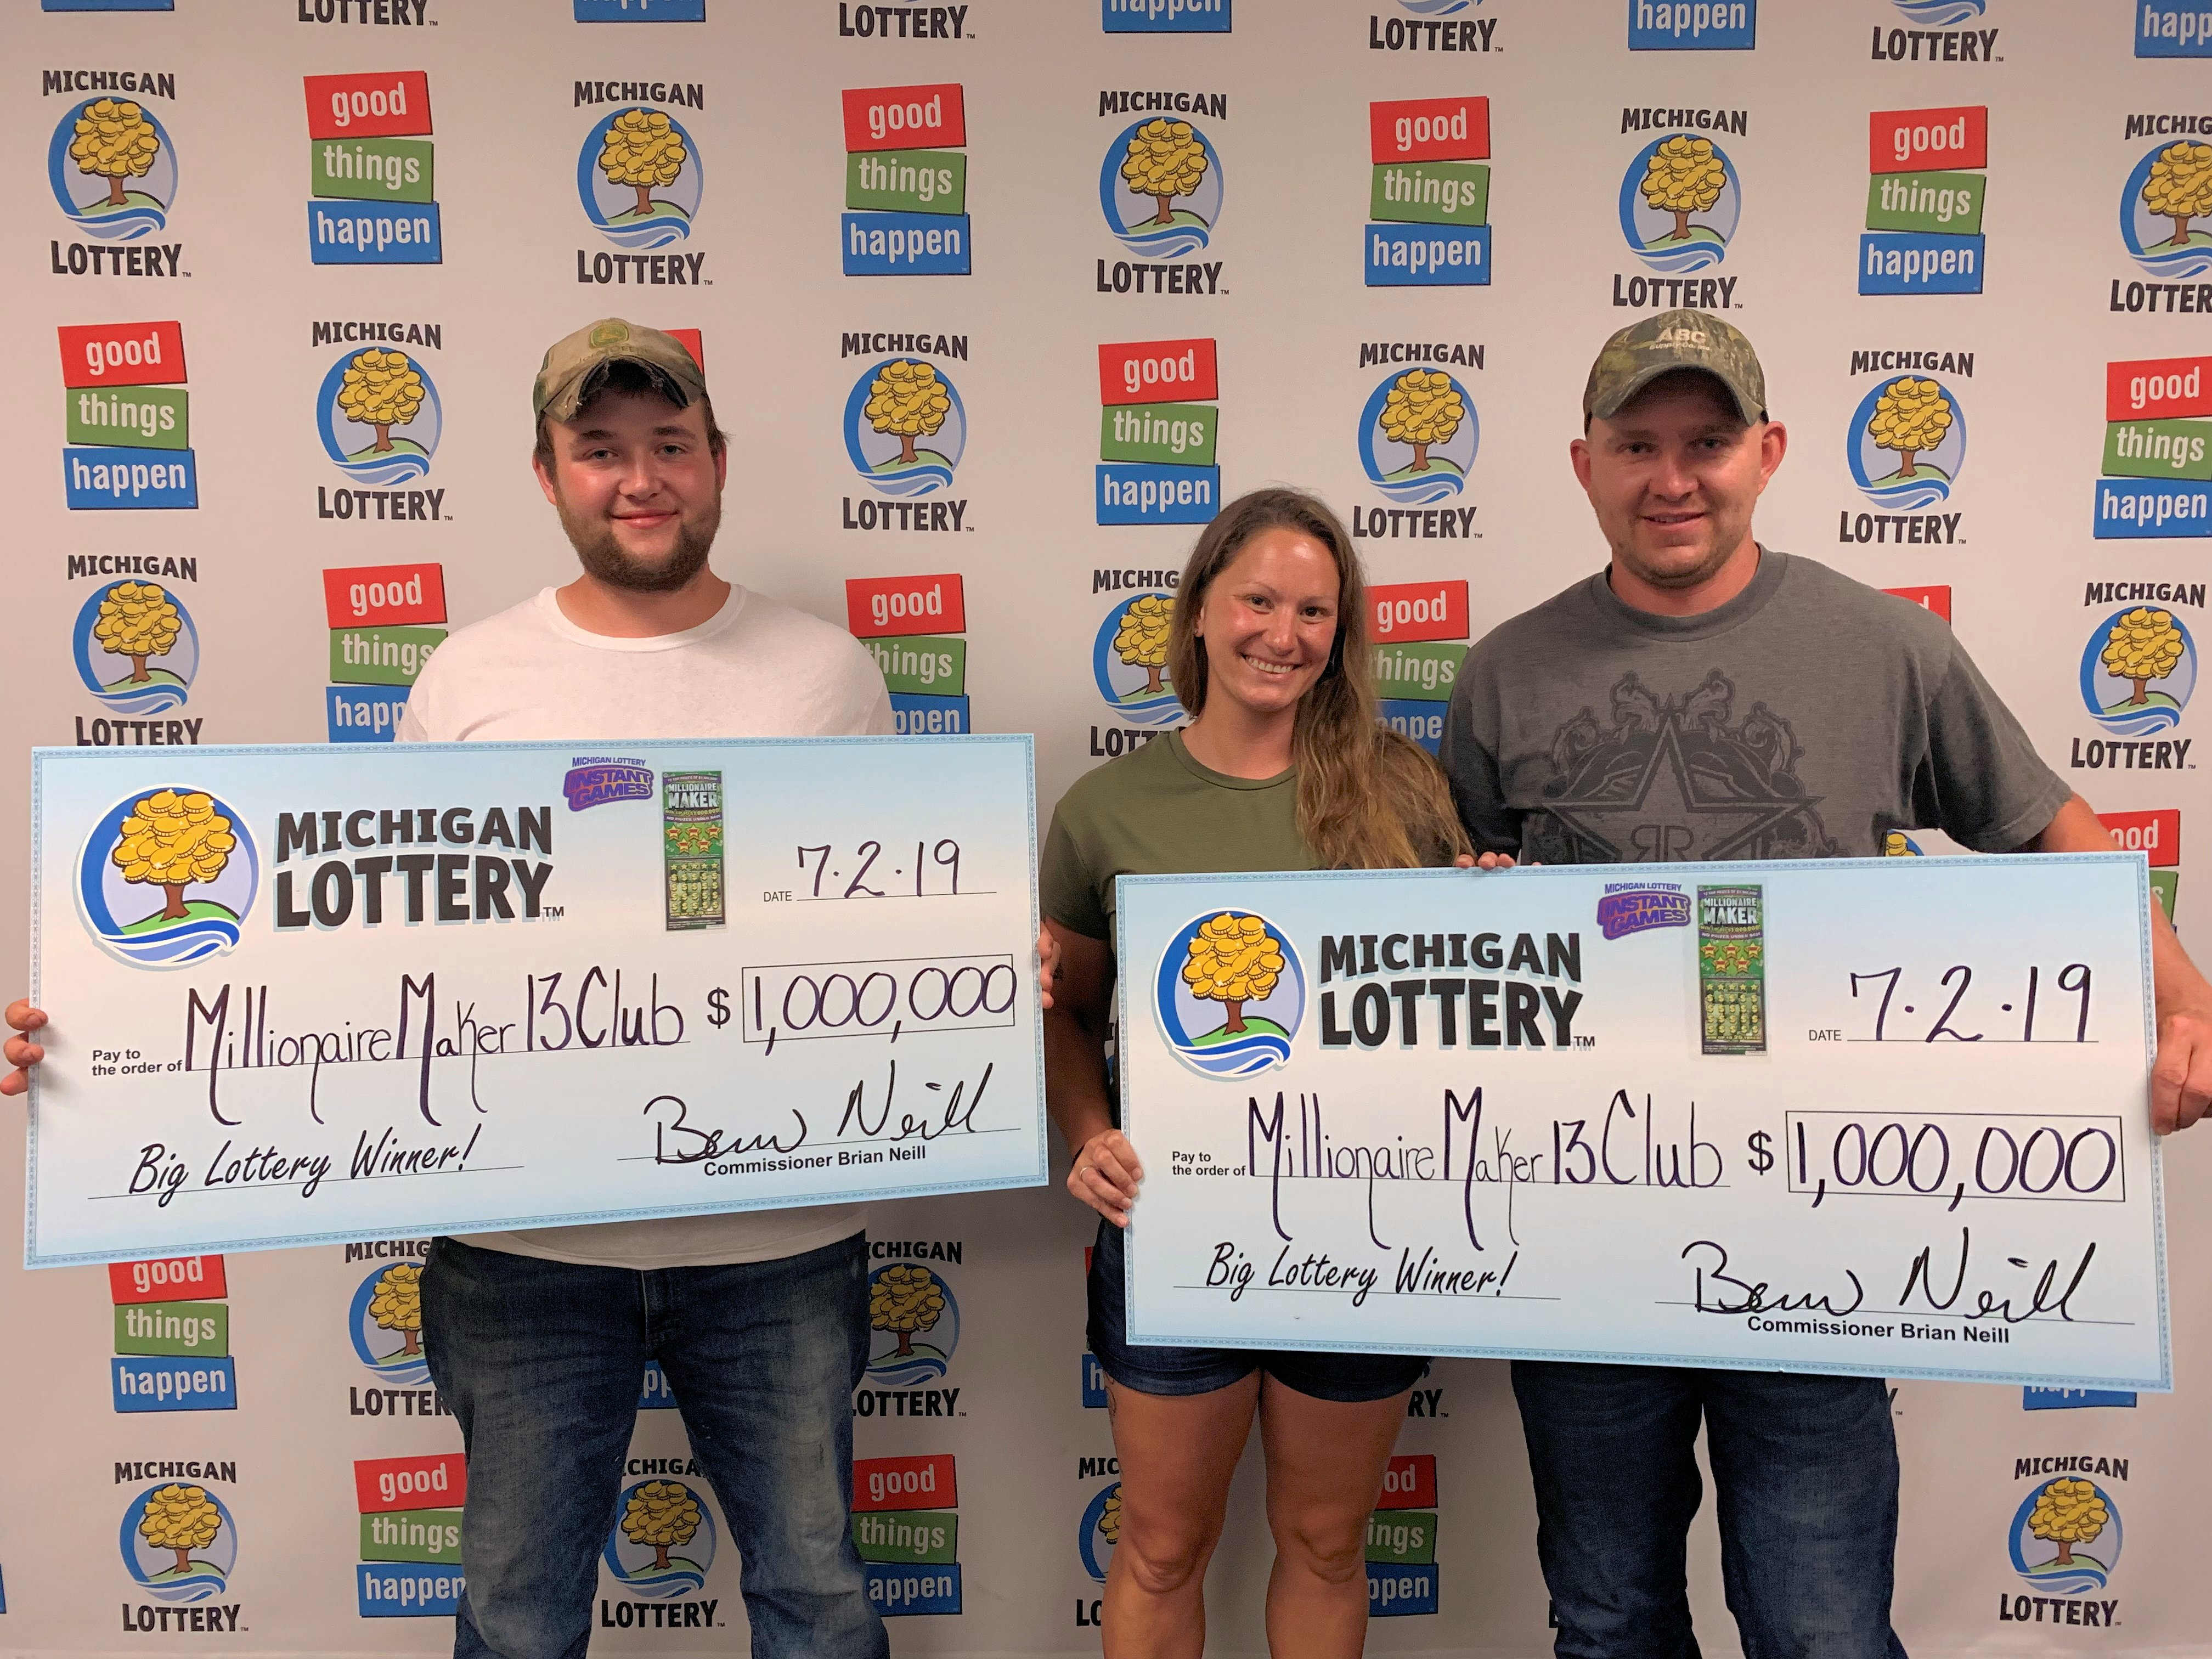 Longtime Friends Win $1 Million Playing the Michigan